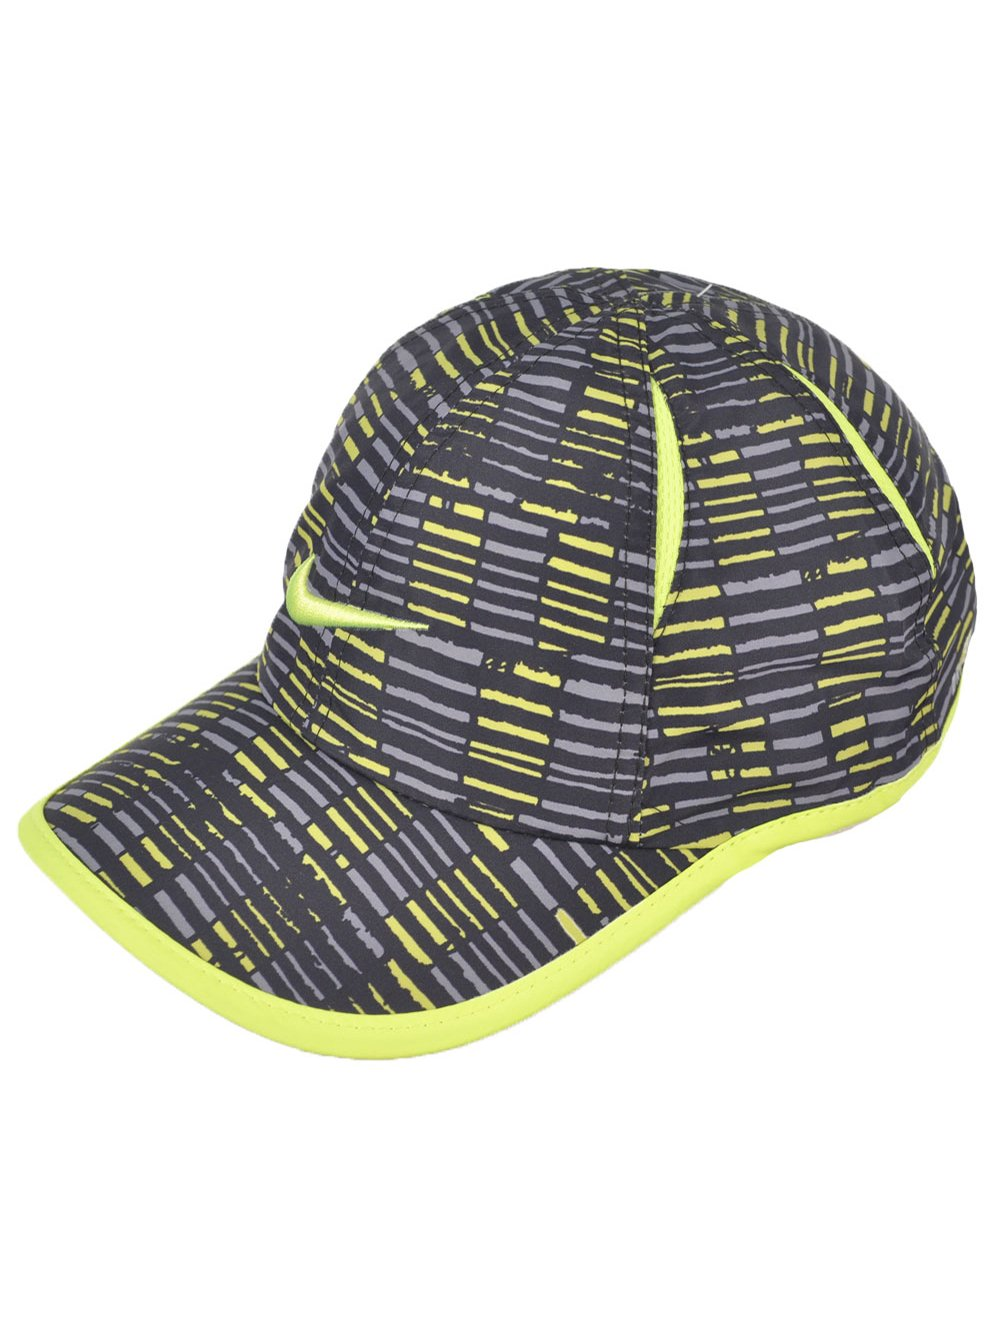 5fe979edf38 Galleon - Boys DRI-FIT Running Hat